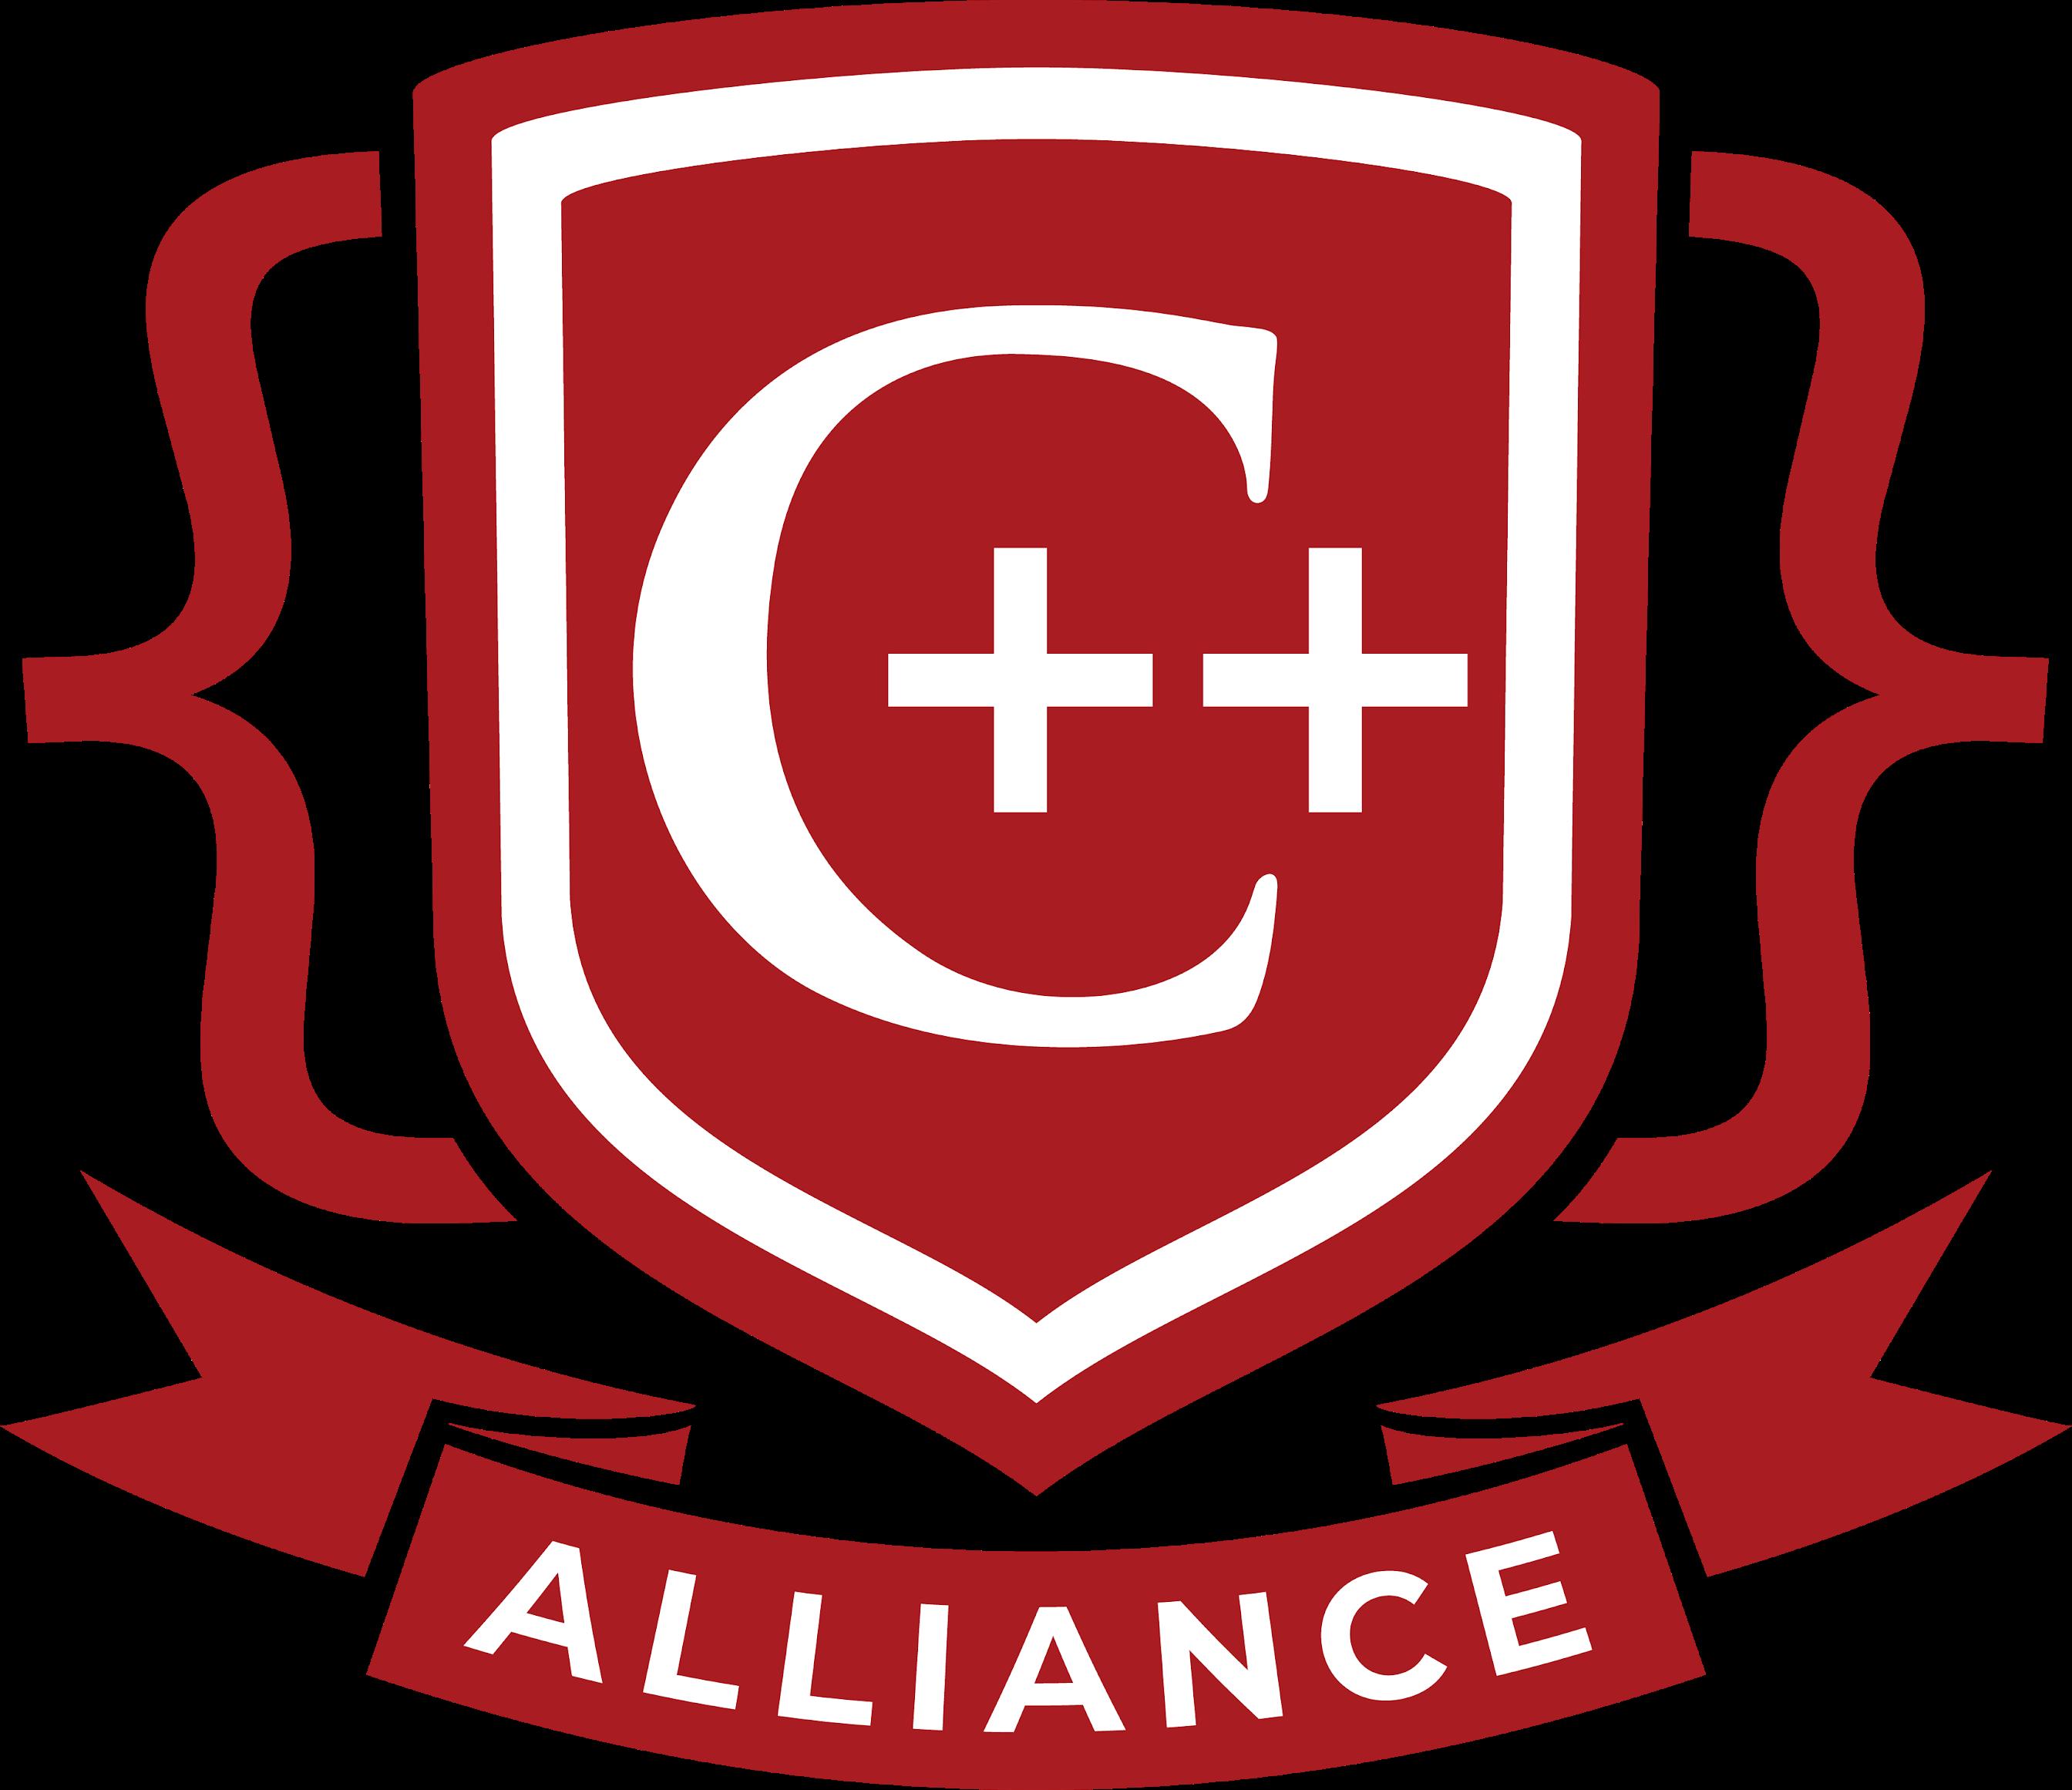 C++ Alliance